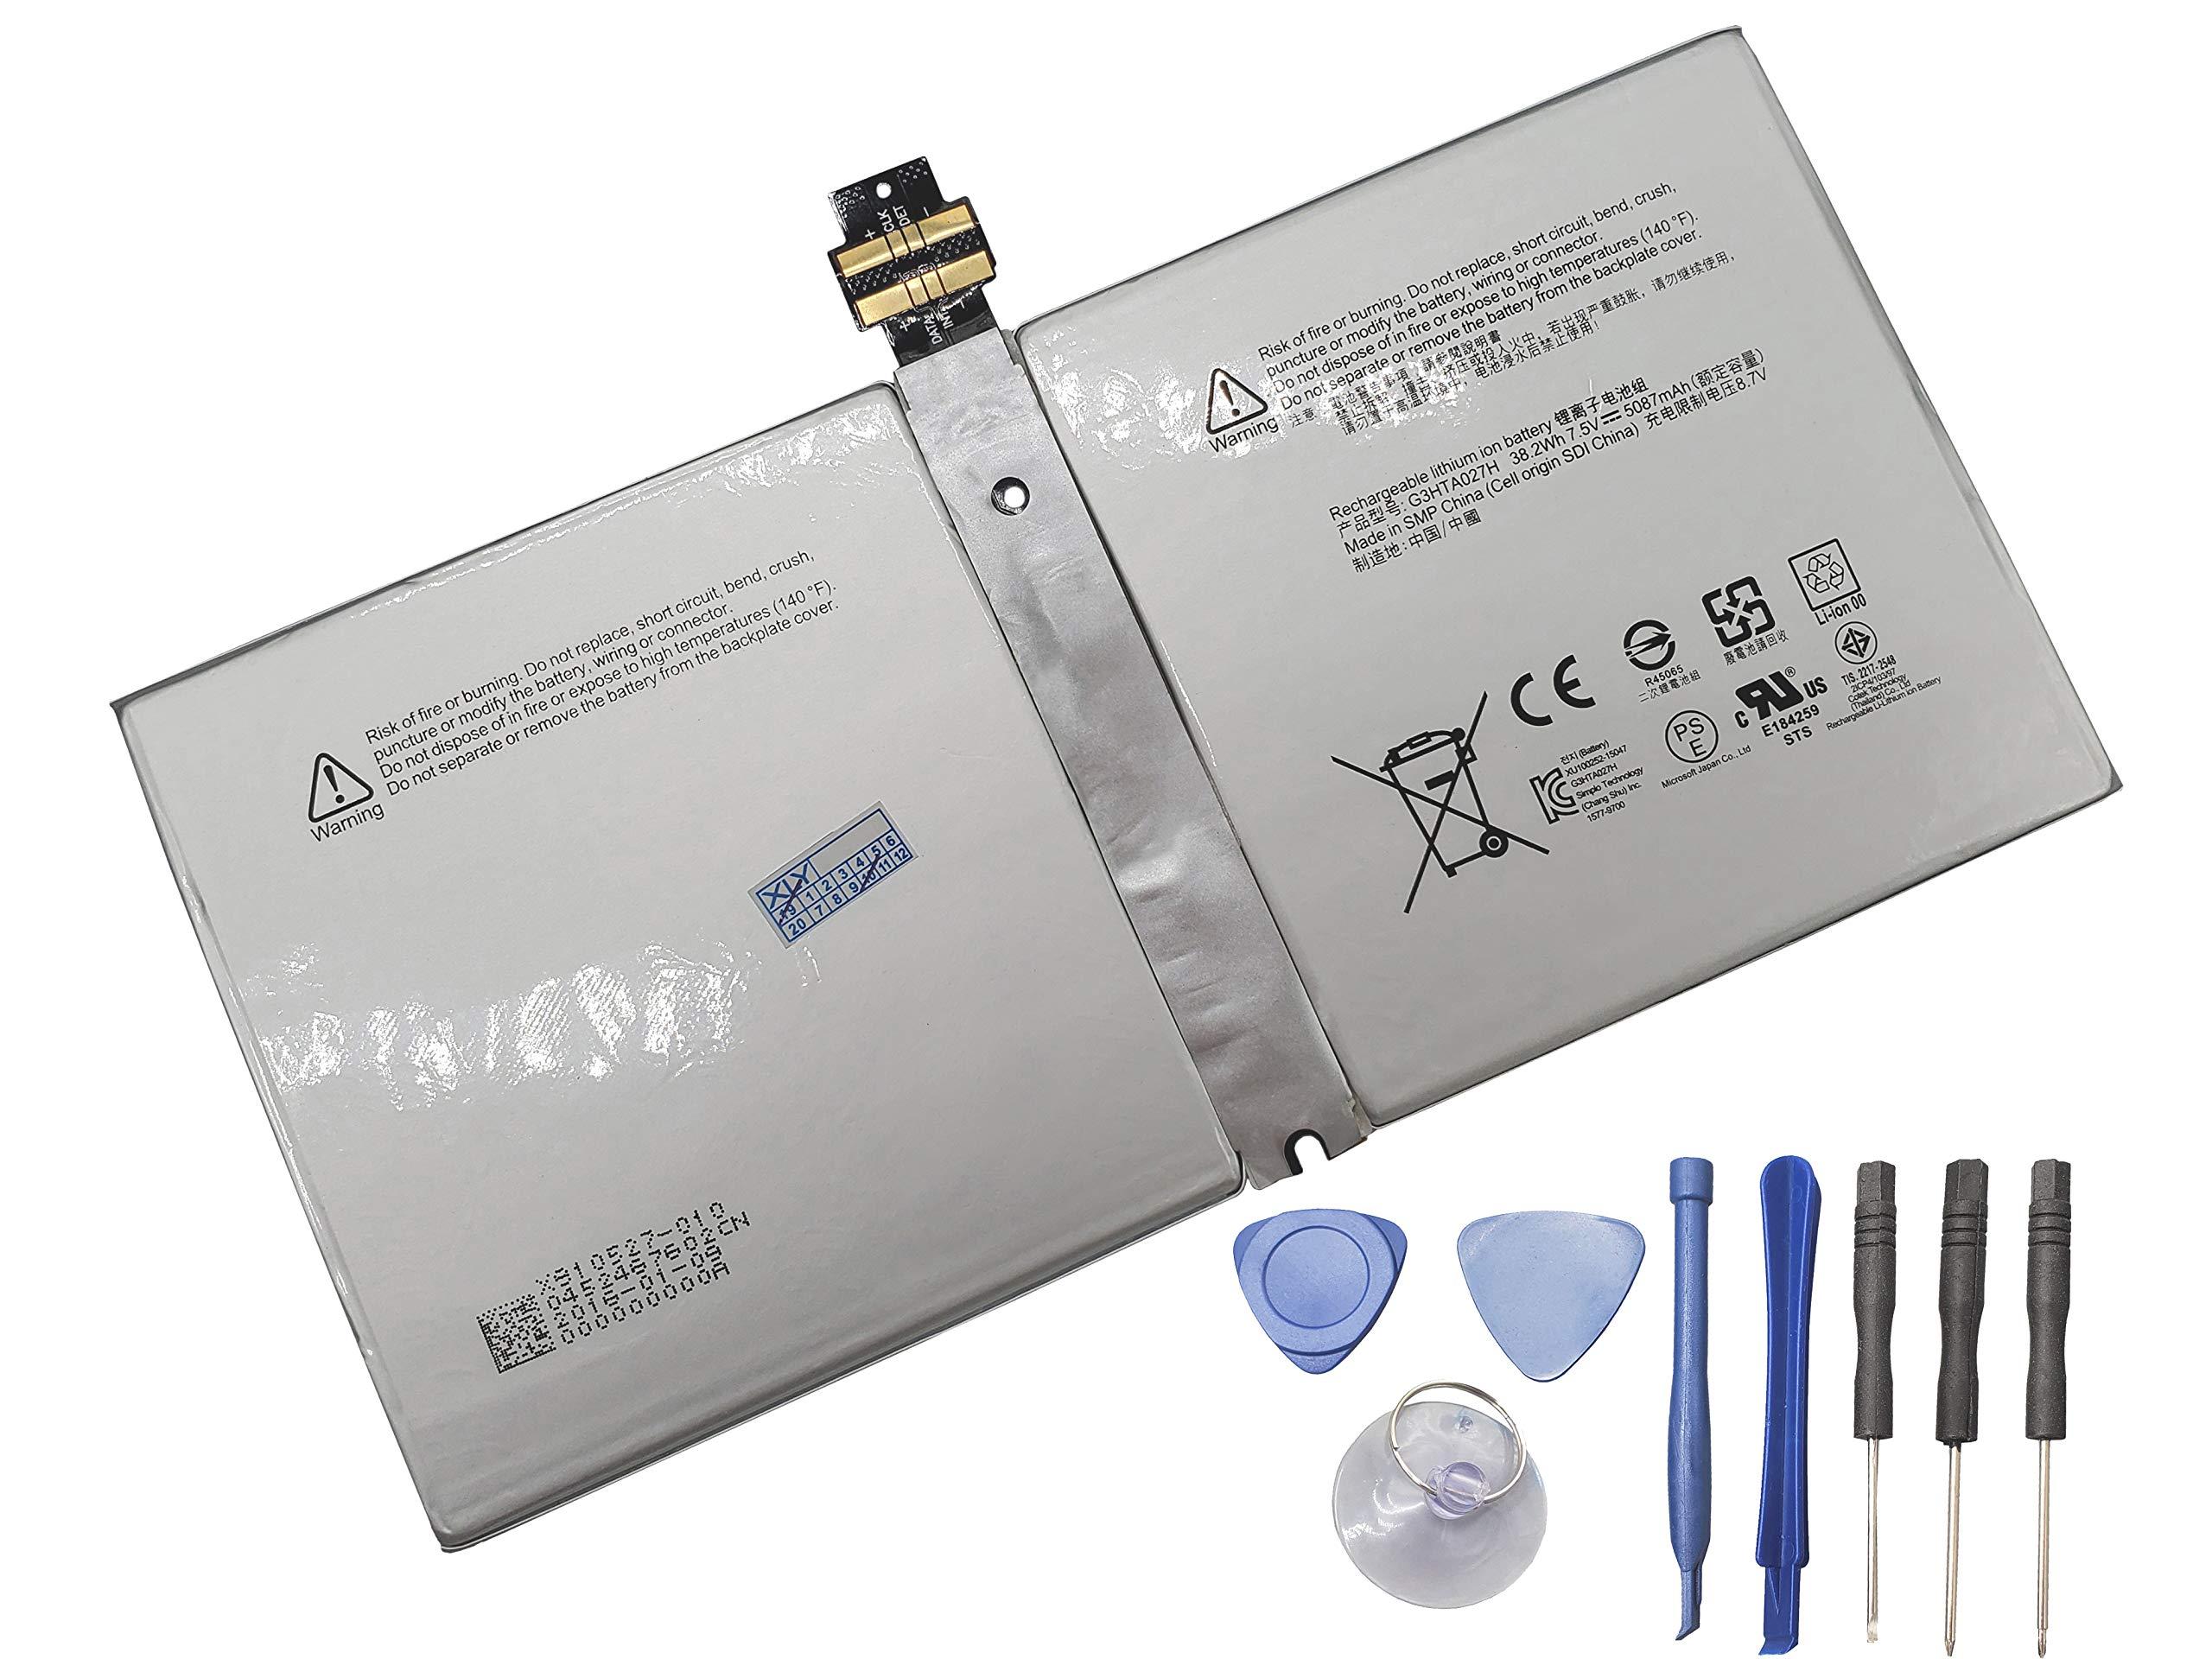 Bateria G3hta027h Dynr01 7.5v 38.2wh Microsoft Surface Pro 4